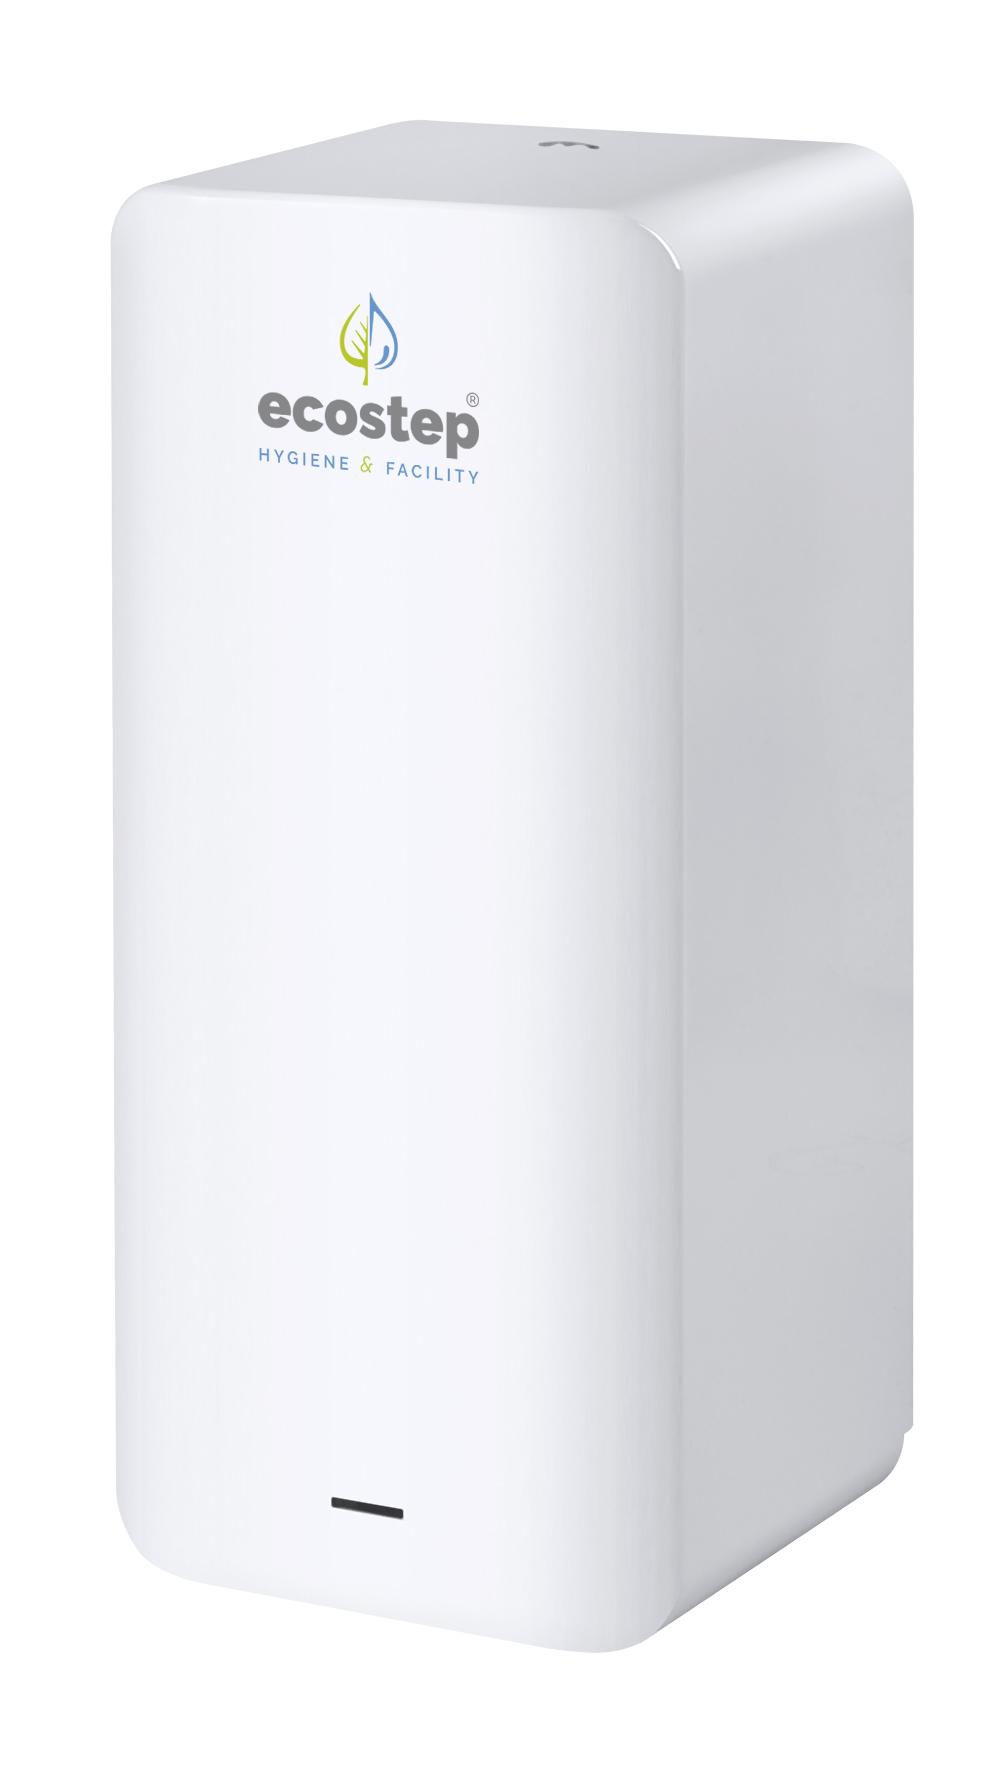 Dezinfekce ECOSTEP S4